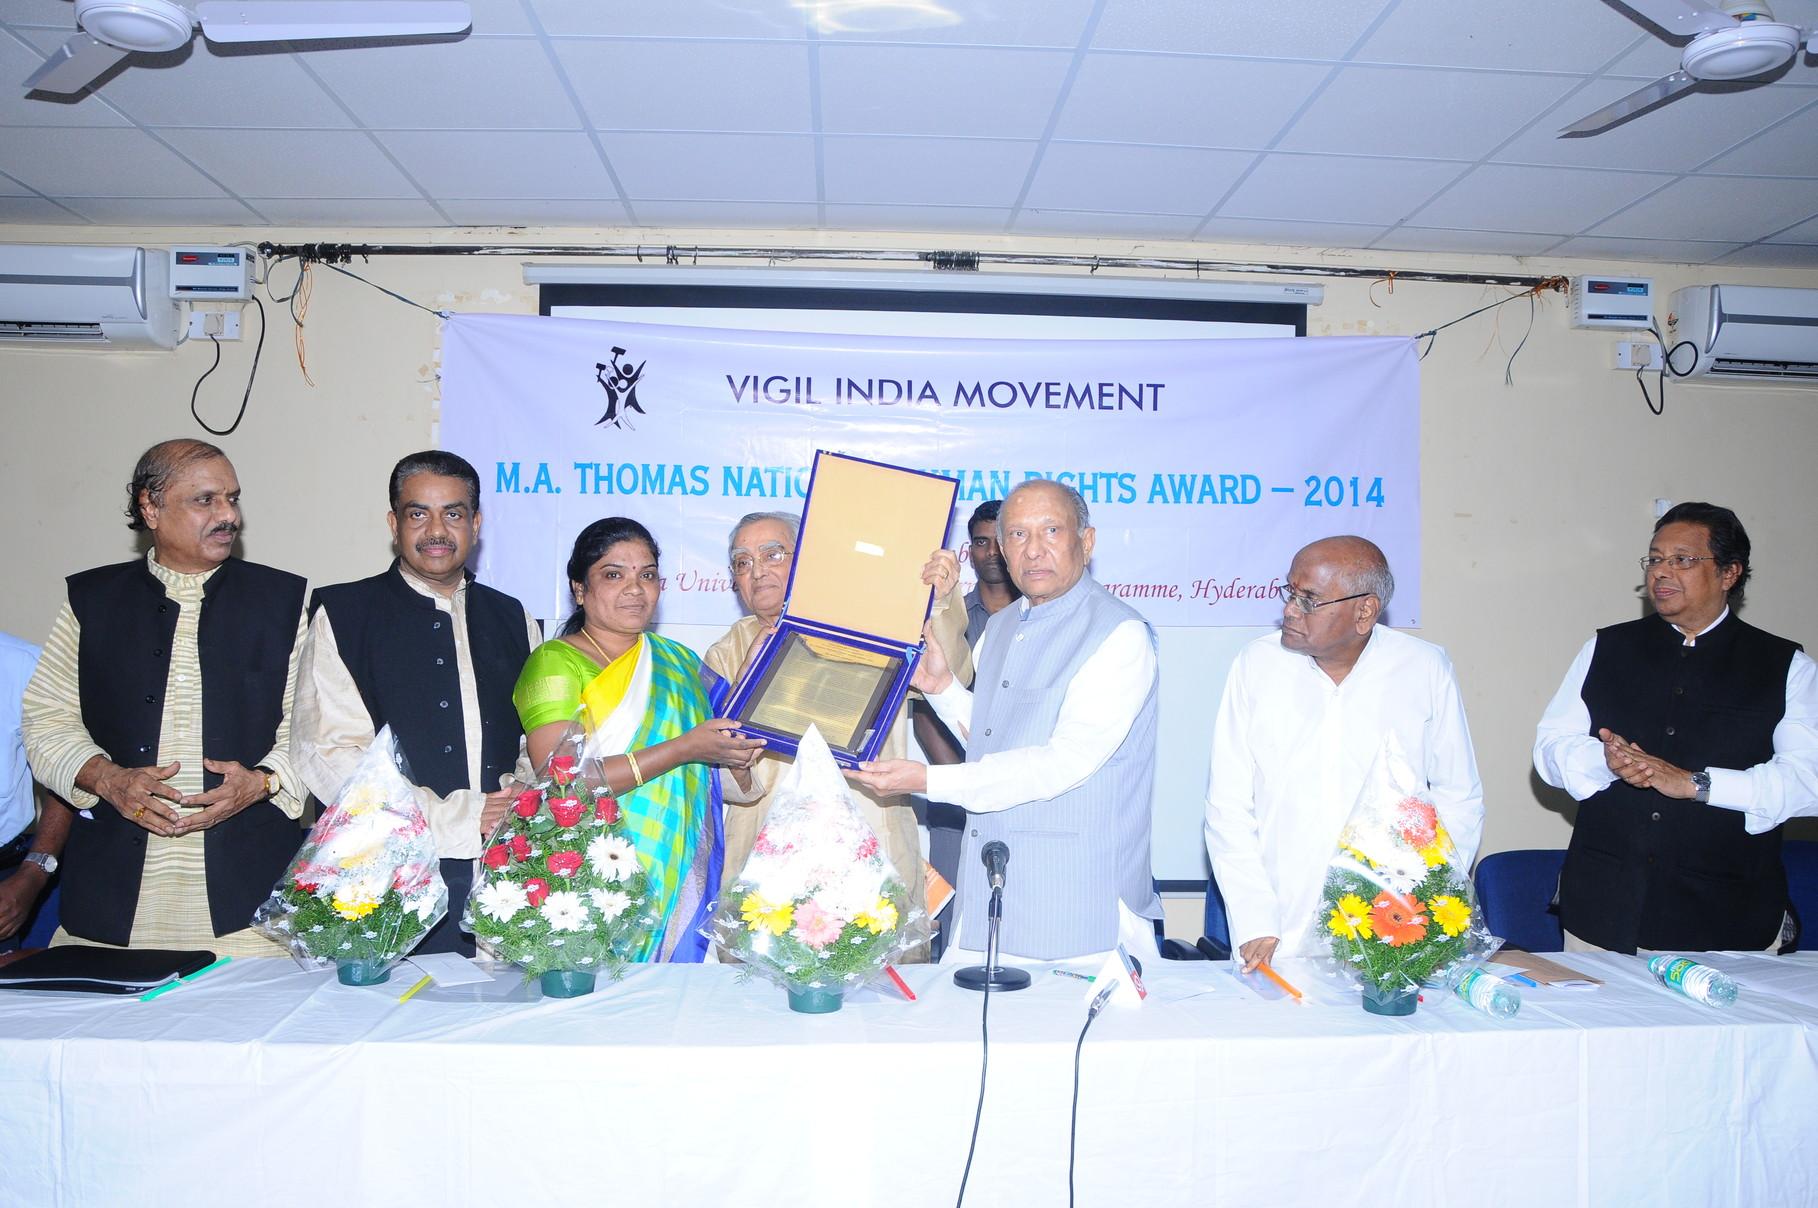 Ms.Bandari.Jayamma,President receives M.A.Thomas National Human Rights Award by the hands of Honorable Chairman,Andhra Pradesh State Legislative Council,Govt.of A.P.,Organized by Vigil India Movement at Centre for International Program,Osmania University